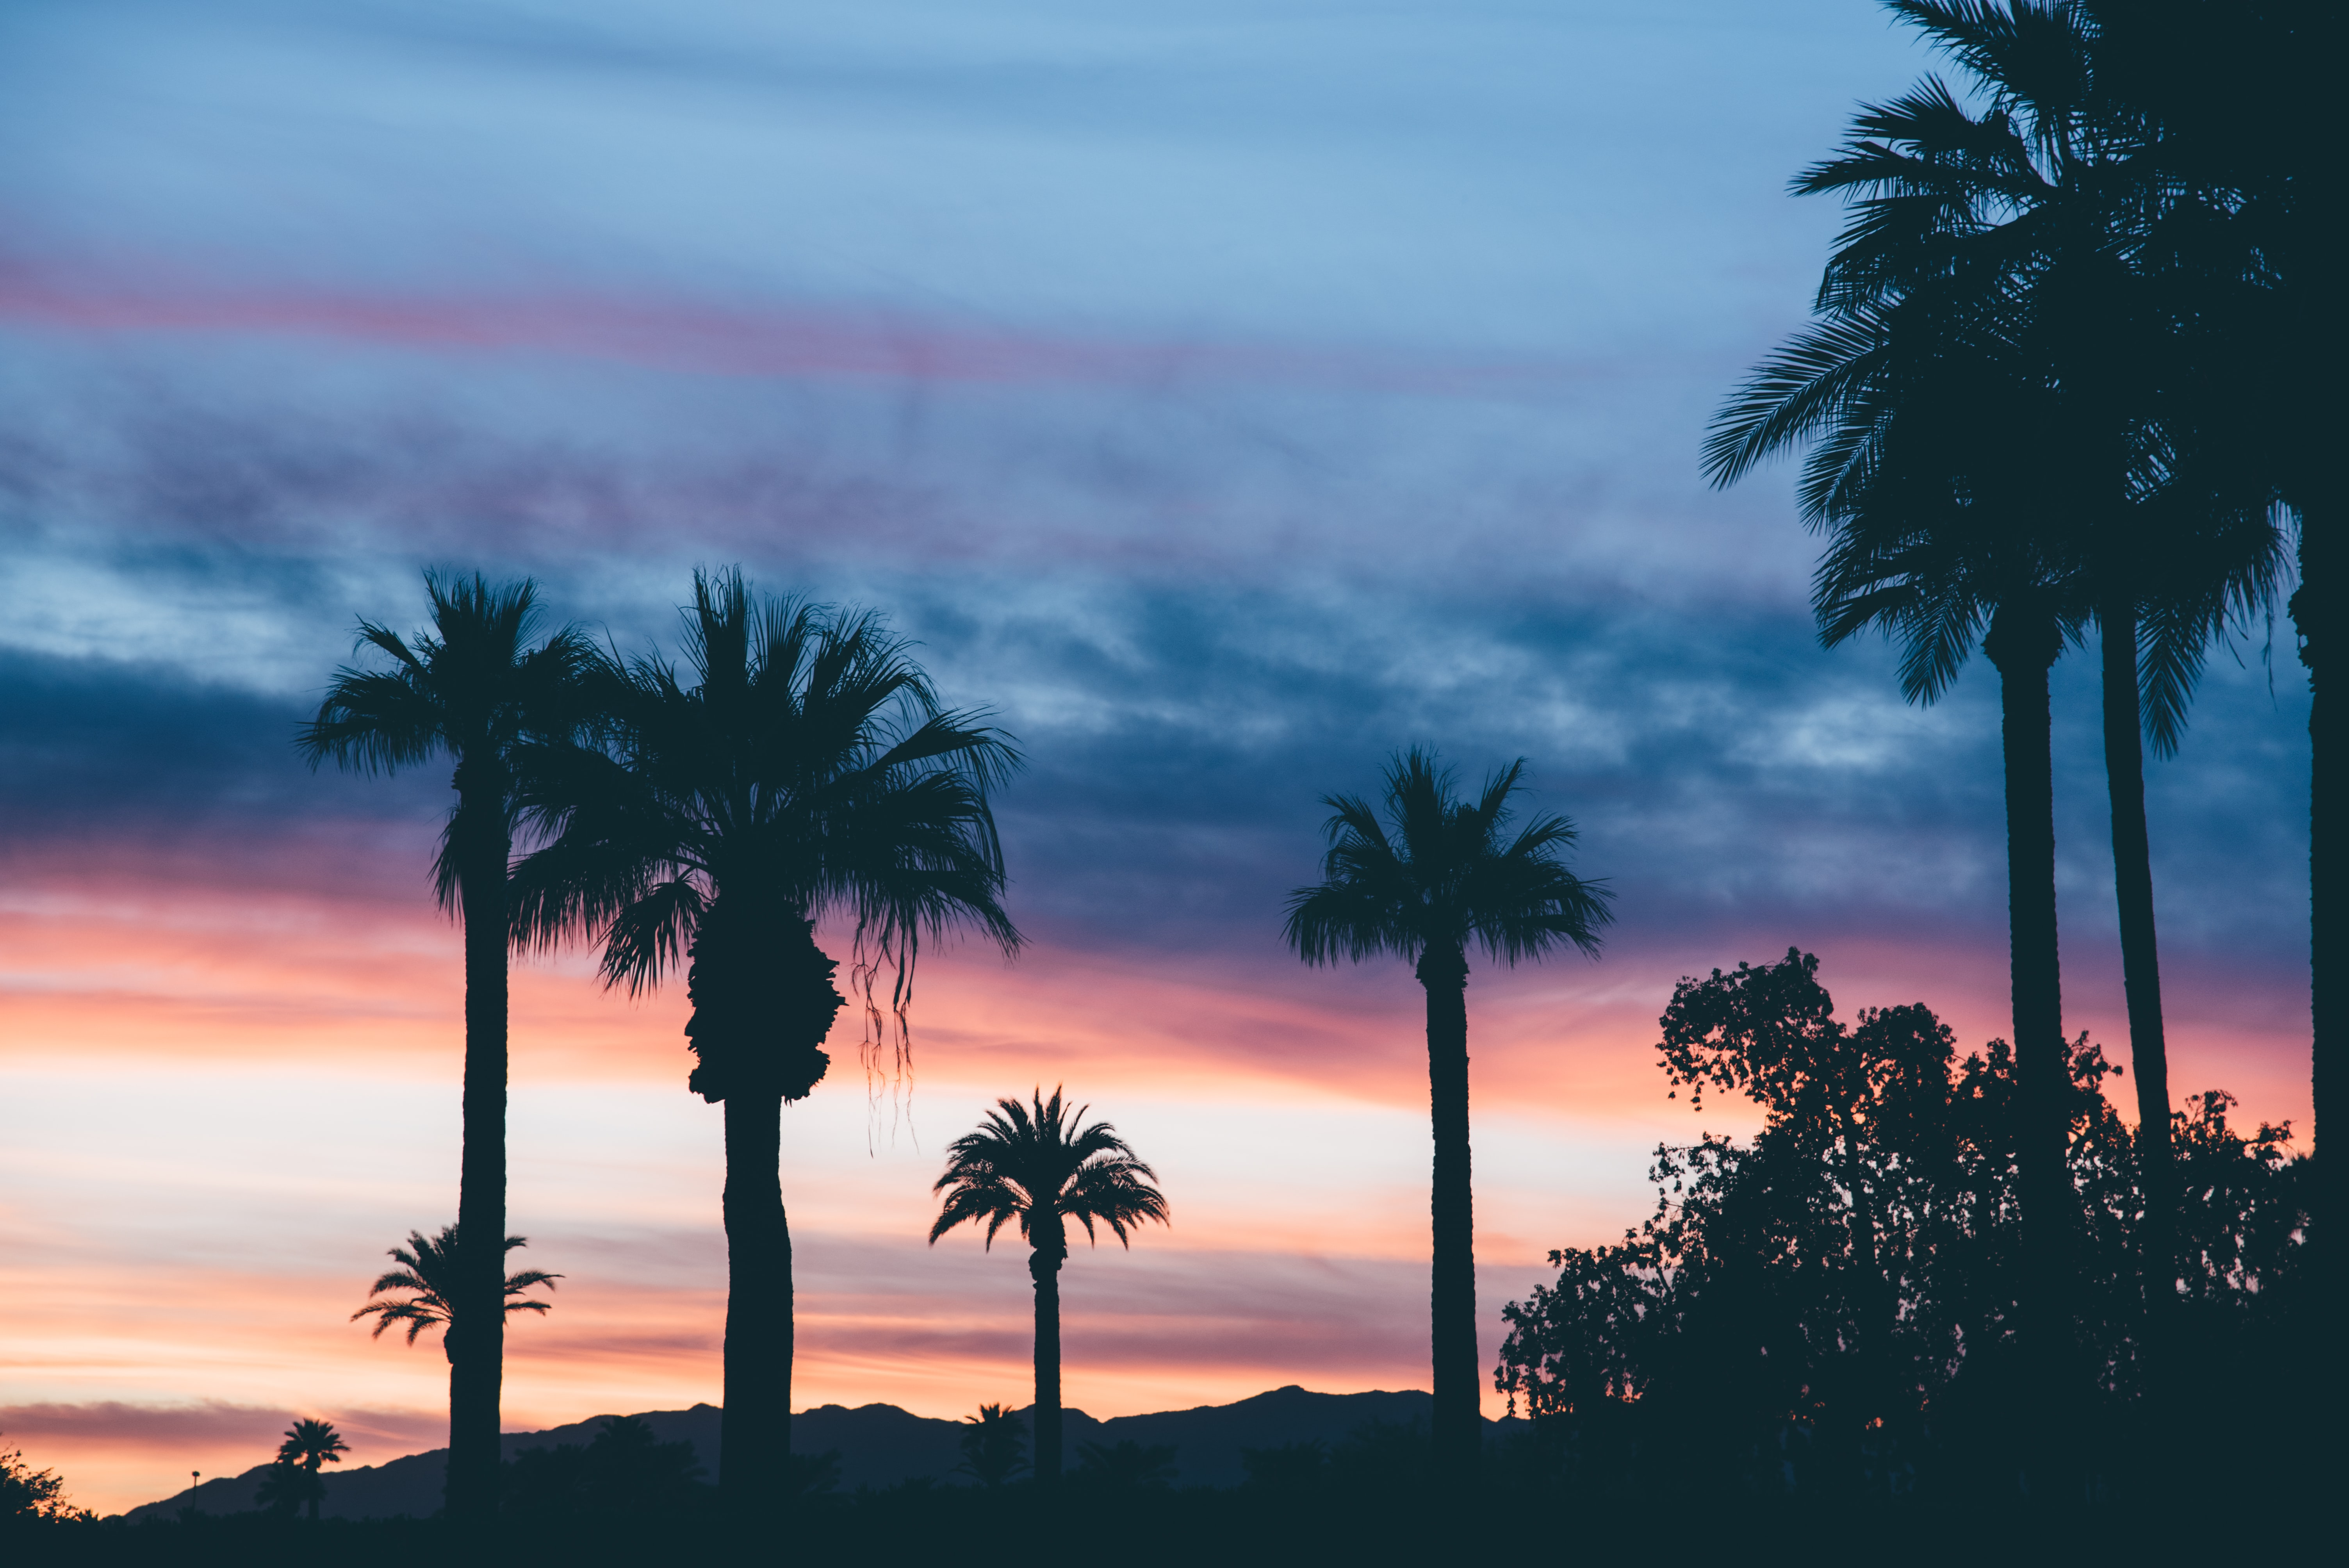 Landscape Supply Co >> Sunset, palm tree, tree and cloud HD photo by Jordan Whitt (@jwwhitt) on Unsplash